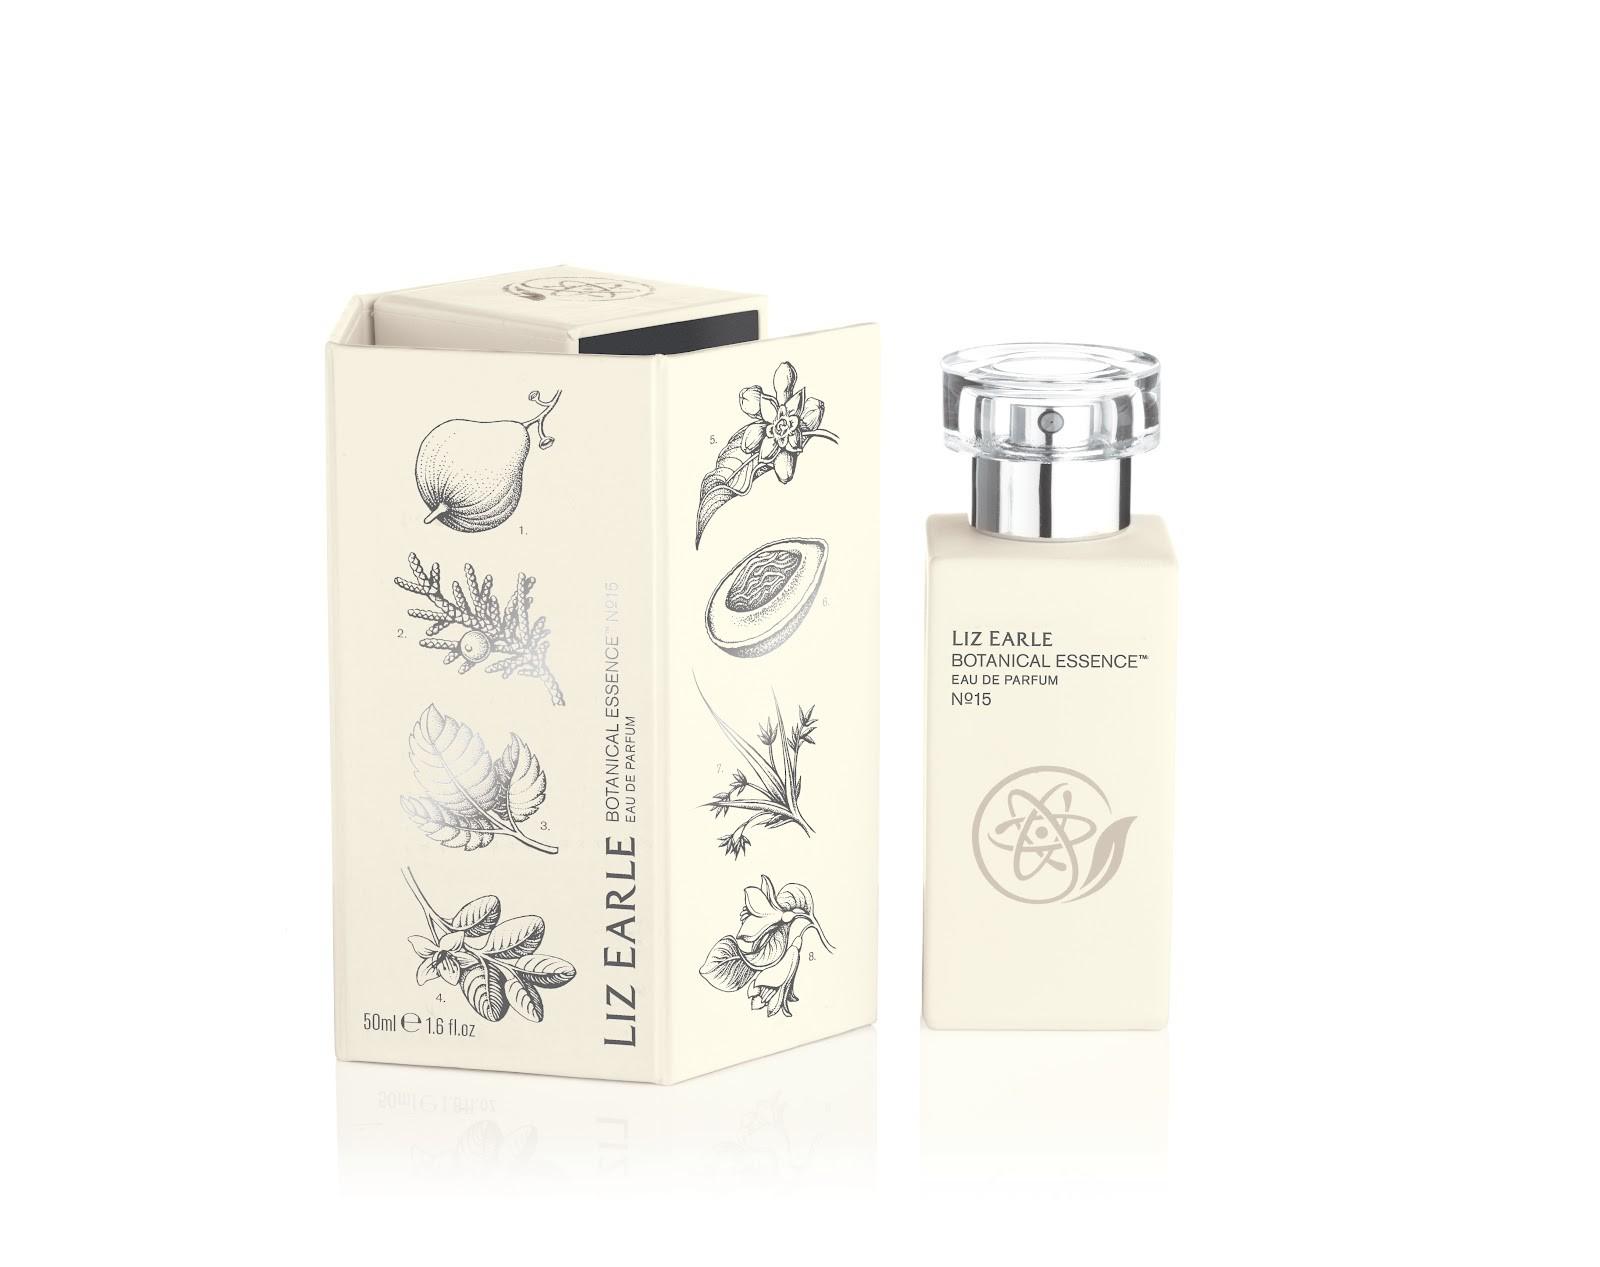 Liz Earle Botanical Essence Nº 15 аромат для женщин